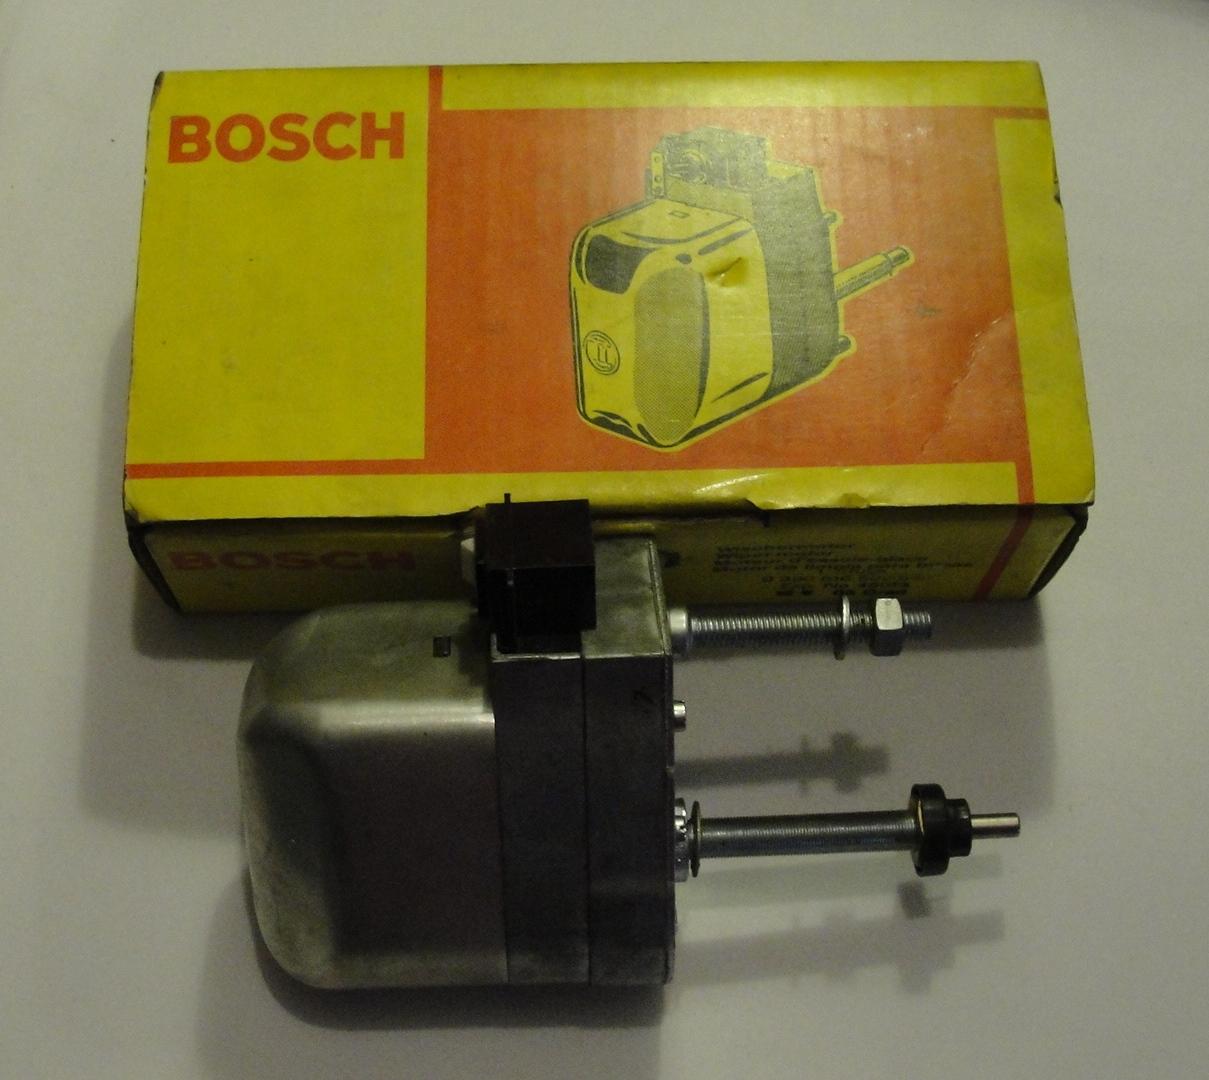 Bosch Wischermotor 0390616502 Wiper Motor Essuie-glace moteur Motor del limpiapa